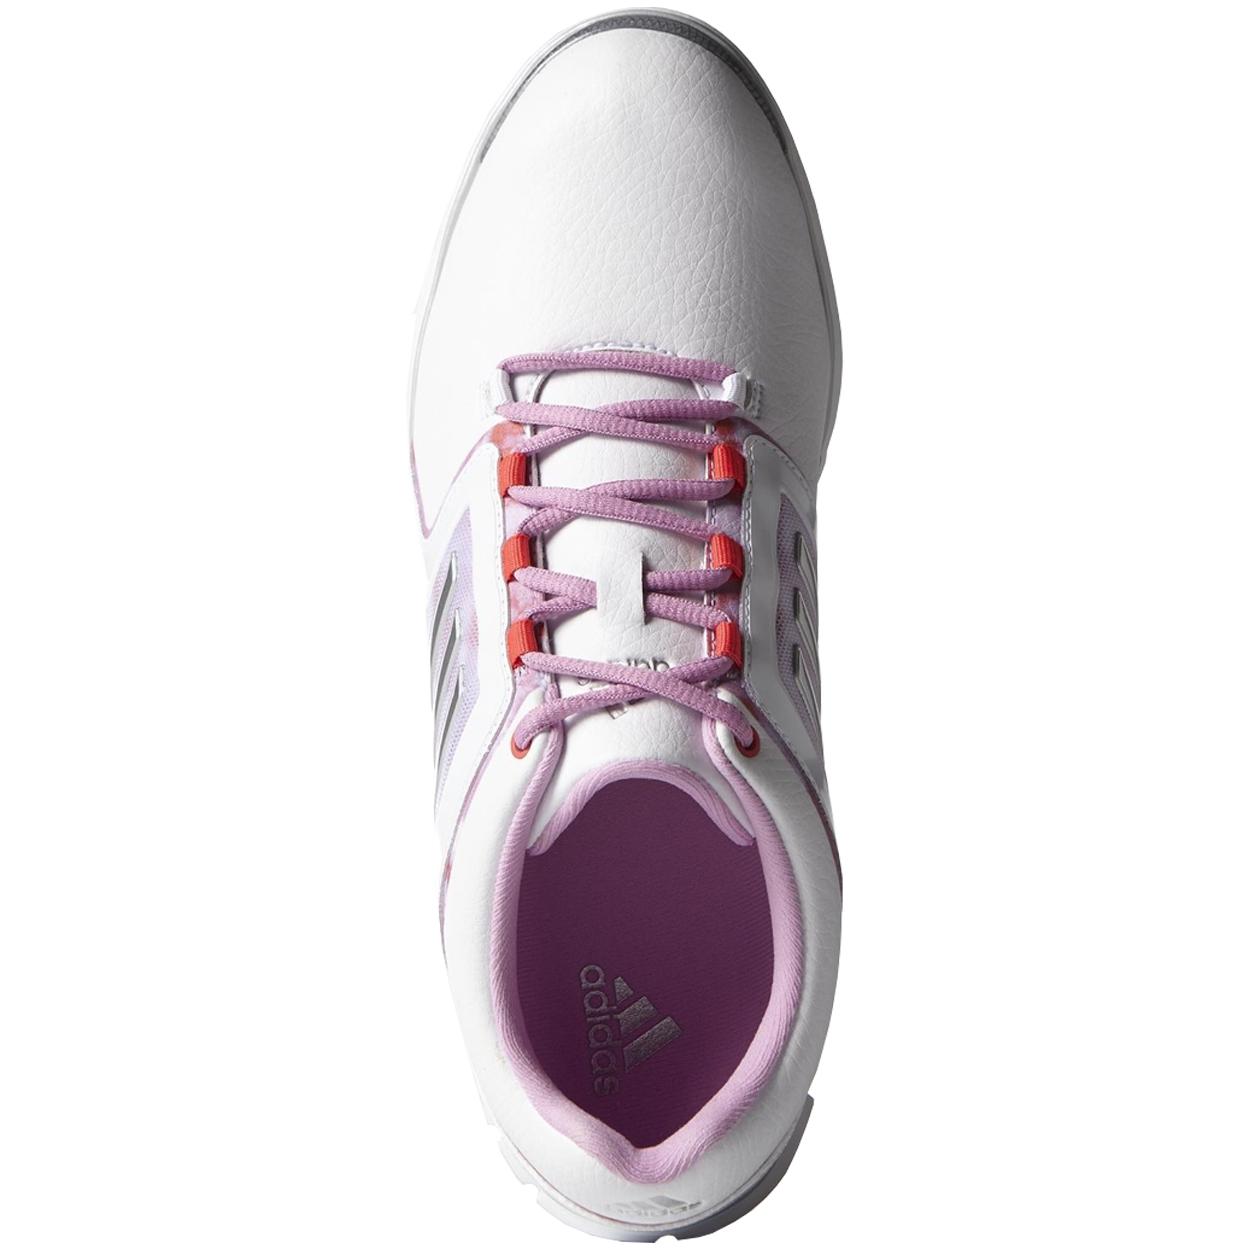 promo code c4bfc 079b8 adidas originals australia online store adida wing shoes